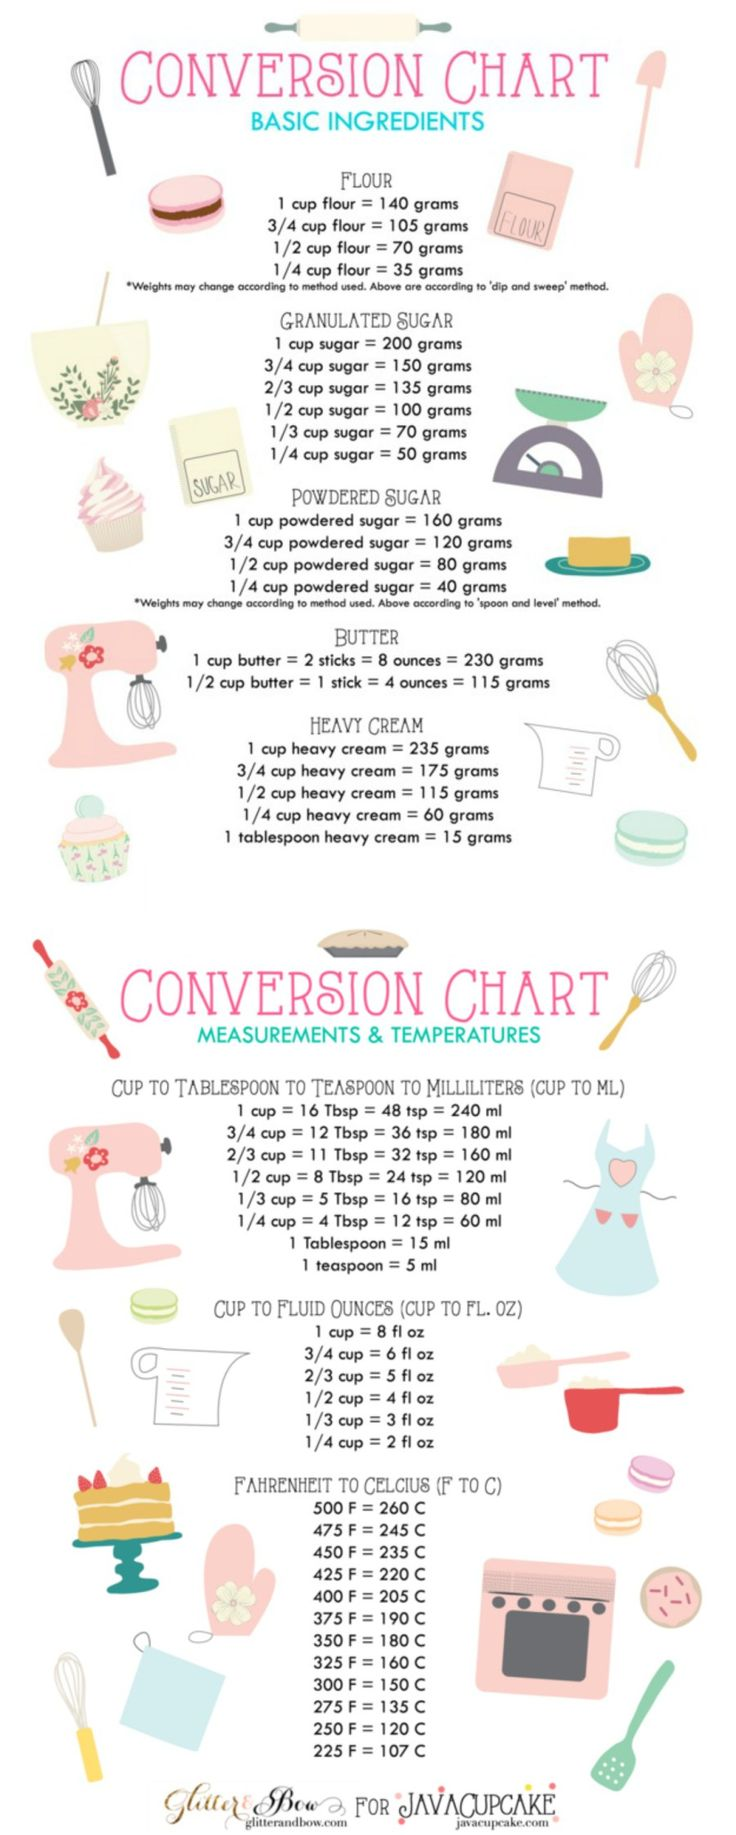 Best conversion charts!